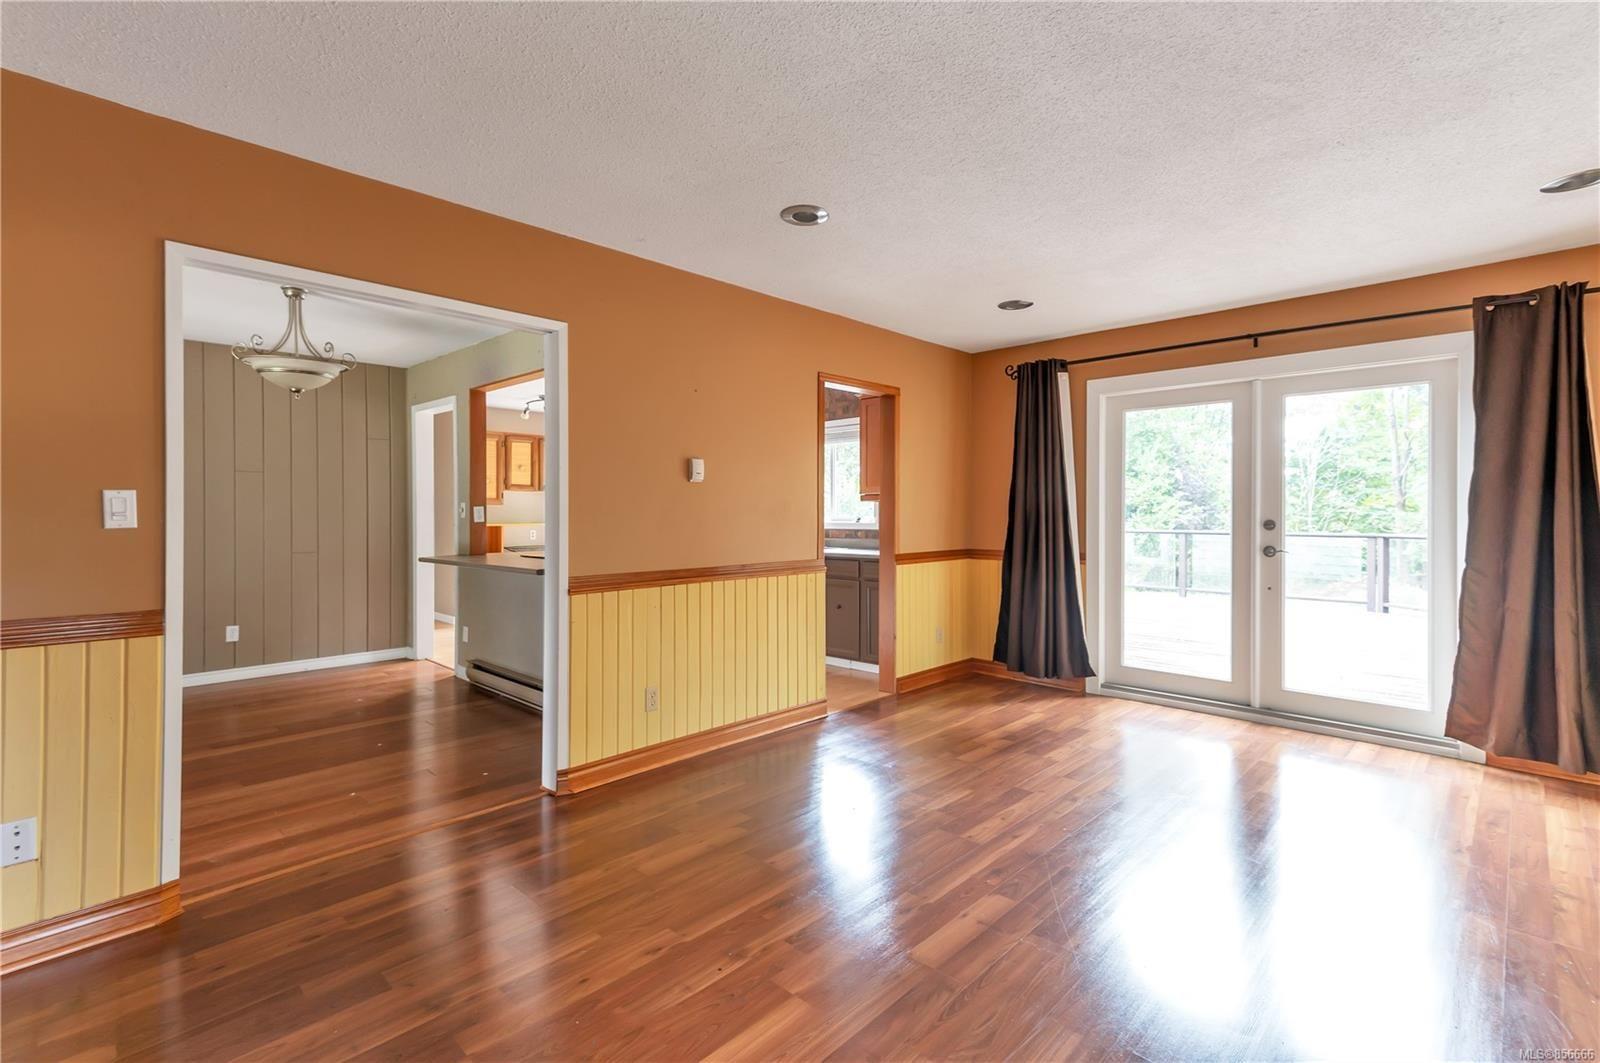 Photo 15: Photos: 2468 Oakes Rd in : CV Merville Black Creek House for sale (Comox Valley)  : MLS®# 856666